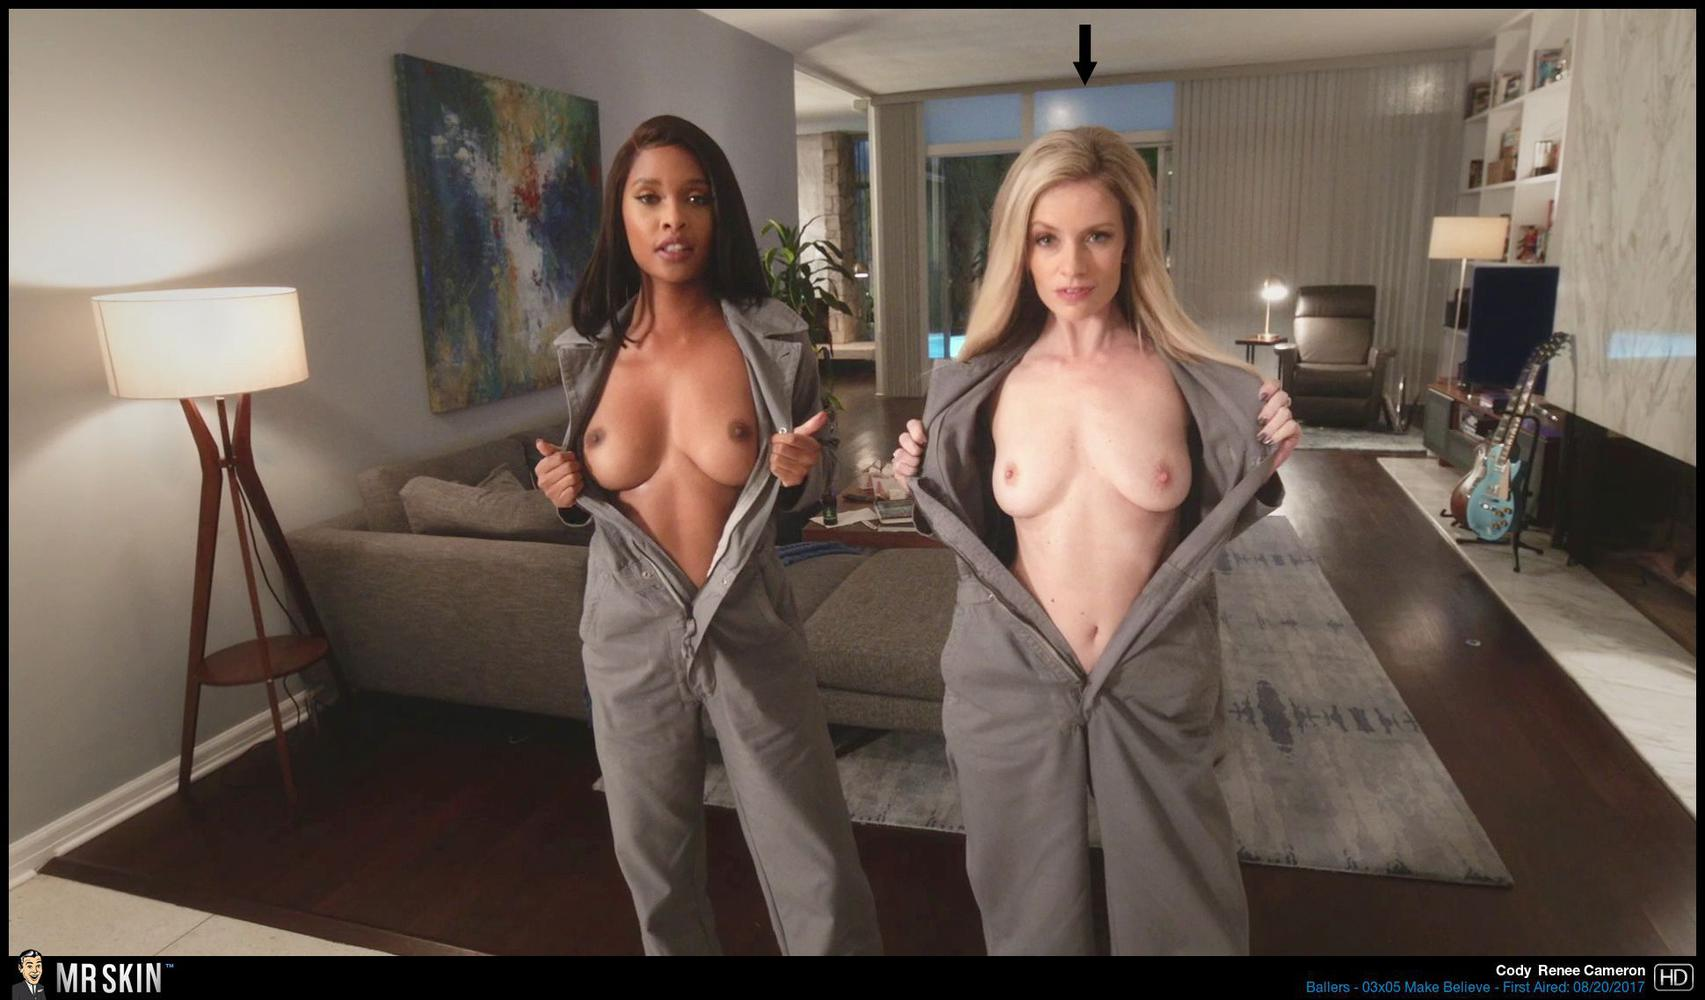 Angela Kinsey Nude skincoming on dvd & blu-ray: half magic, ballers s3, & more